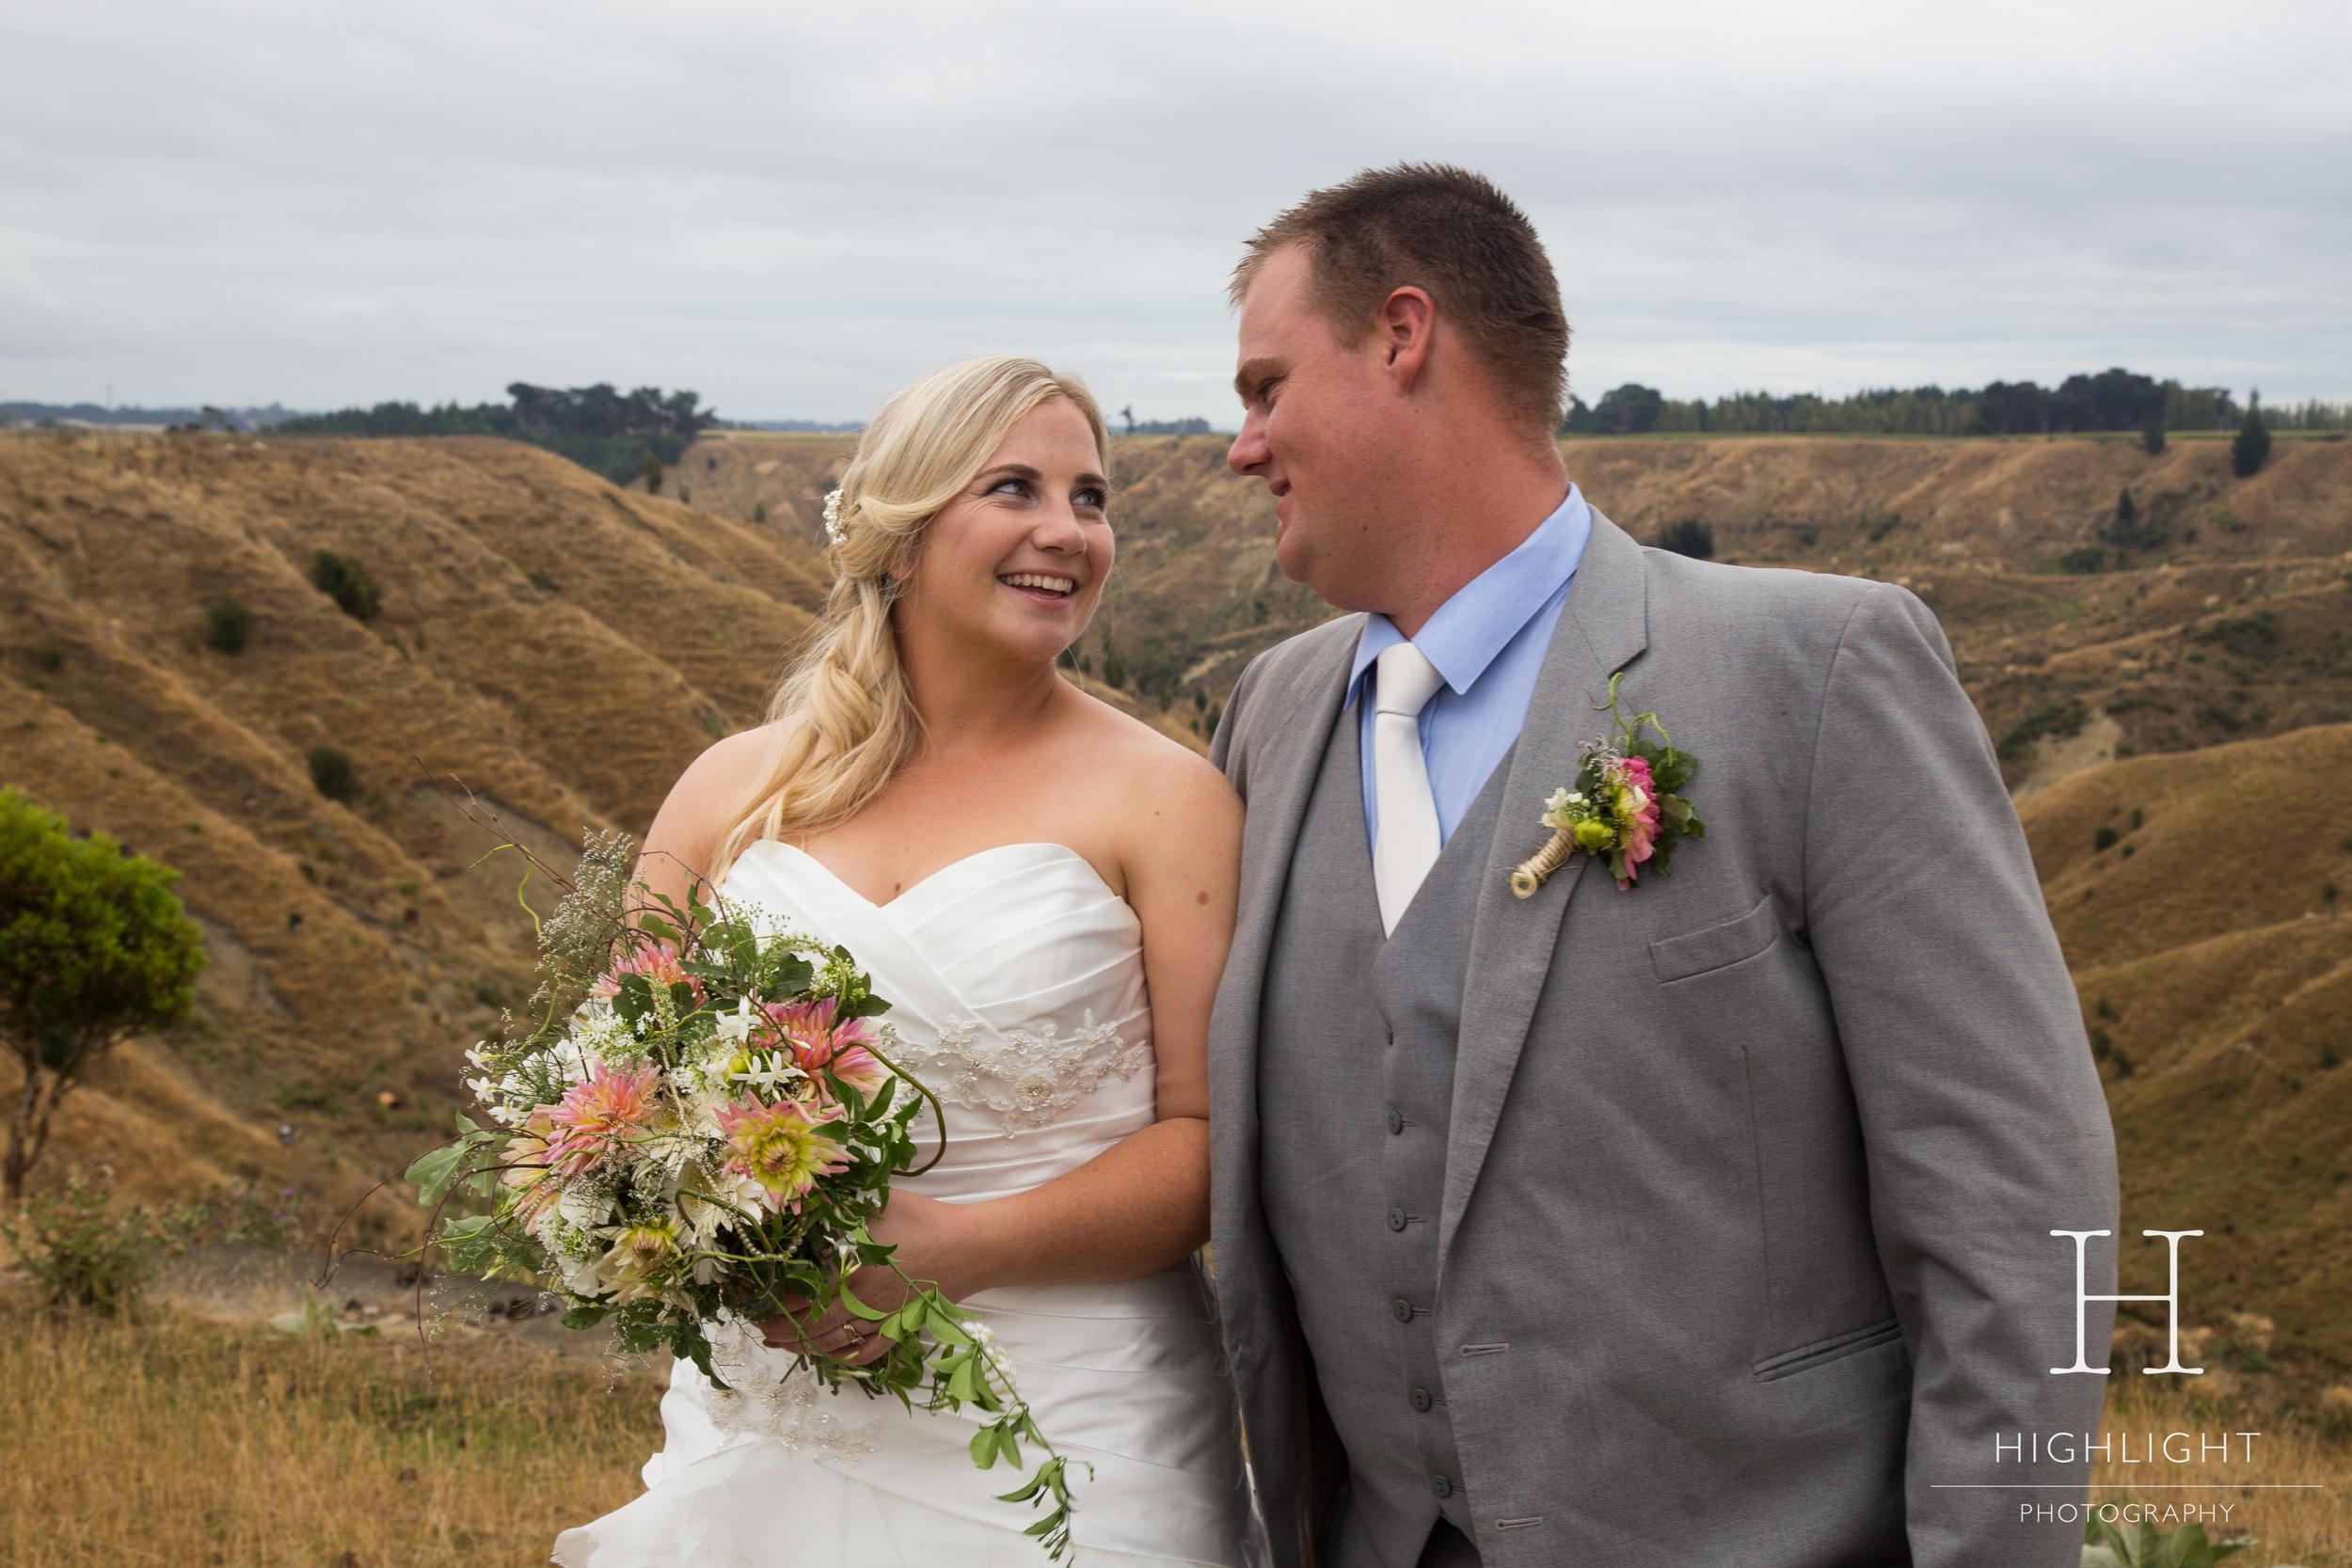 highlight_photography_wedding_new_zealand_bridalparty.jpg